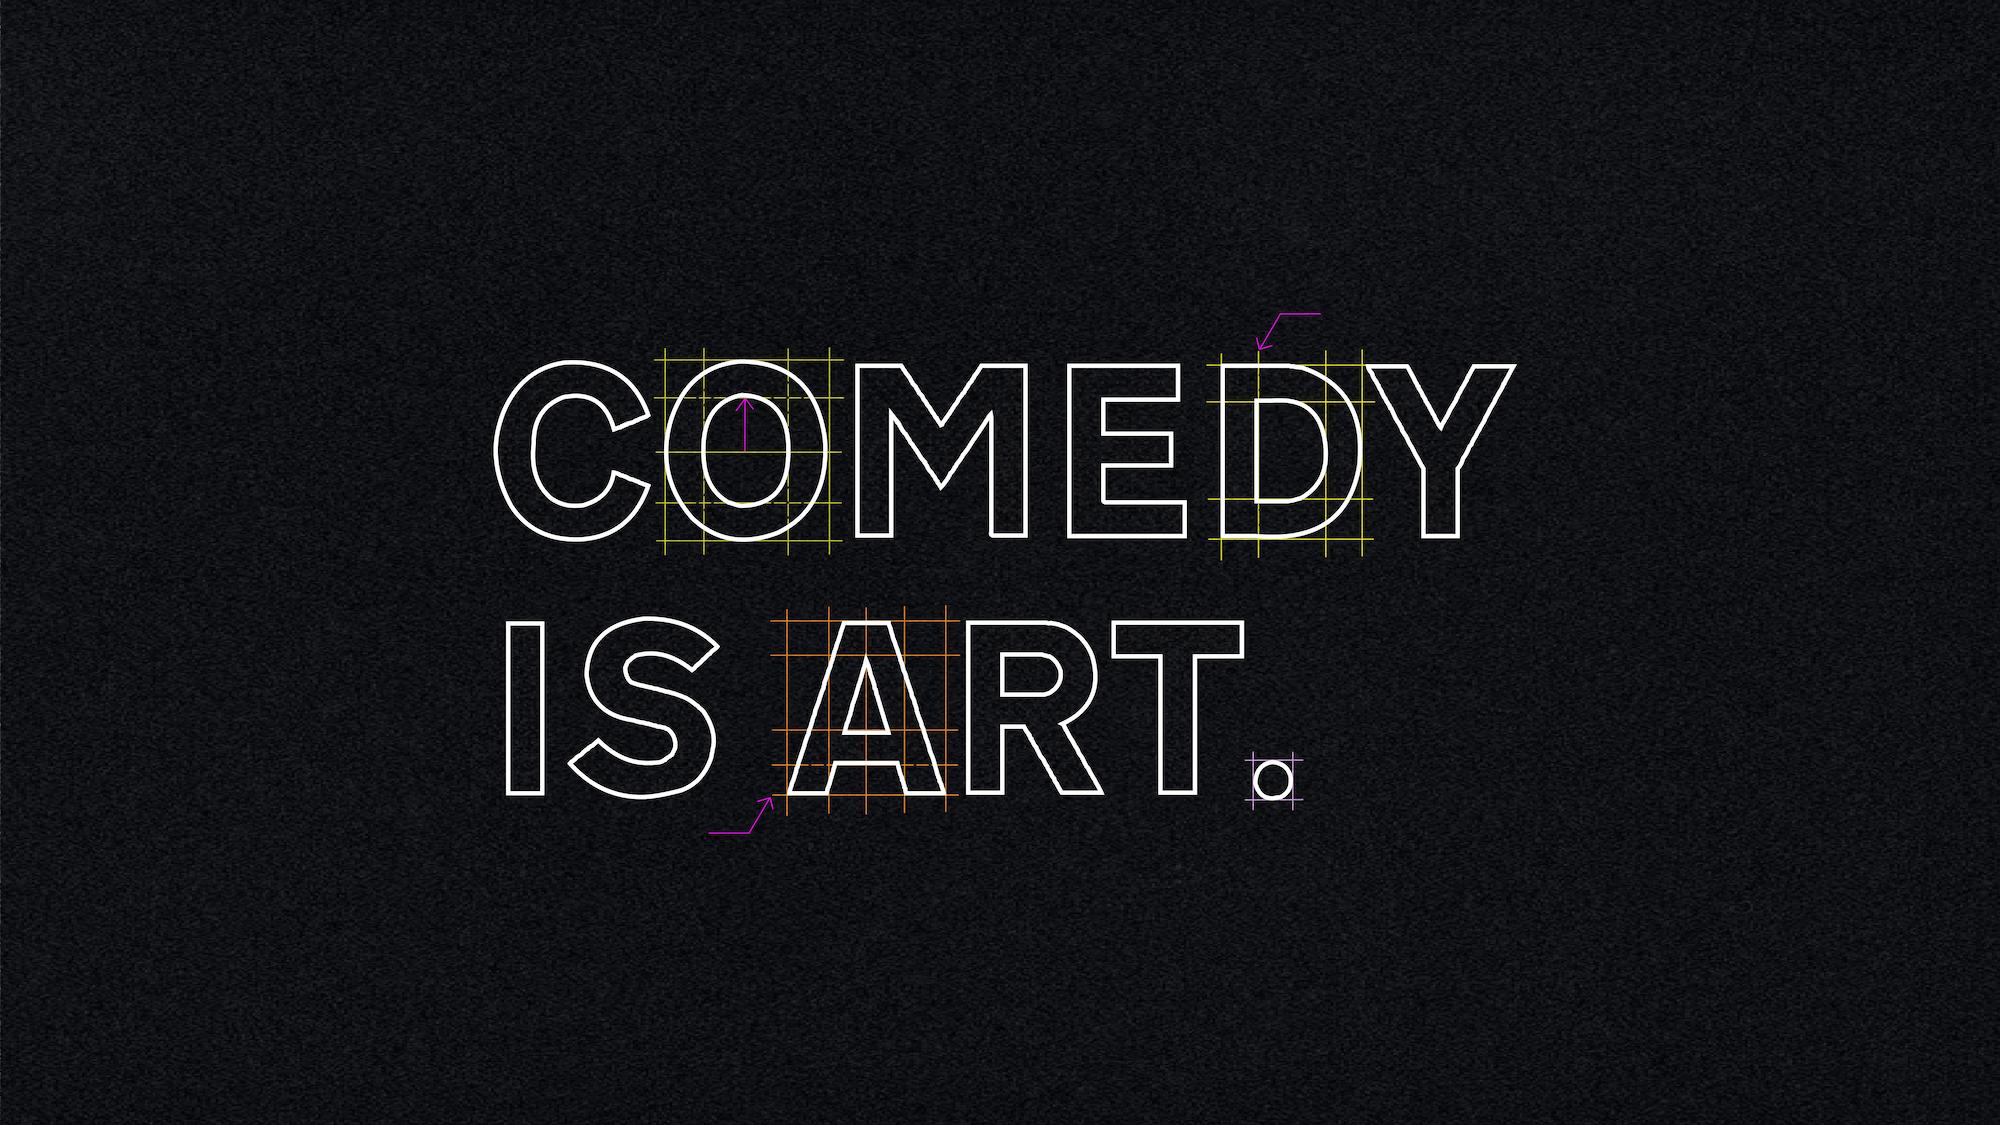 Comedy is Art